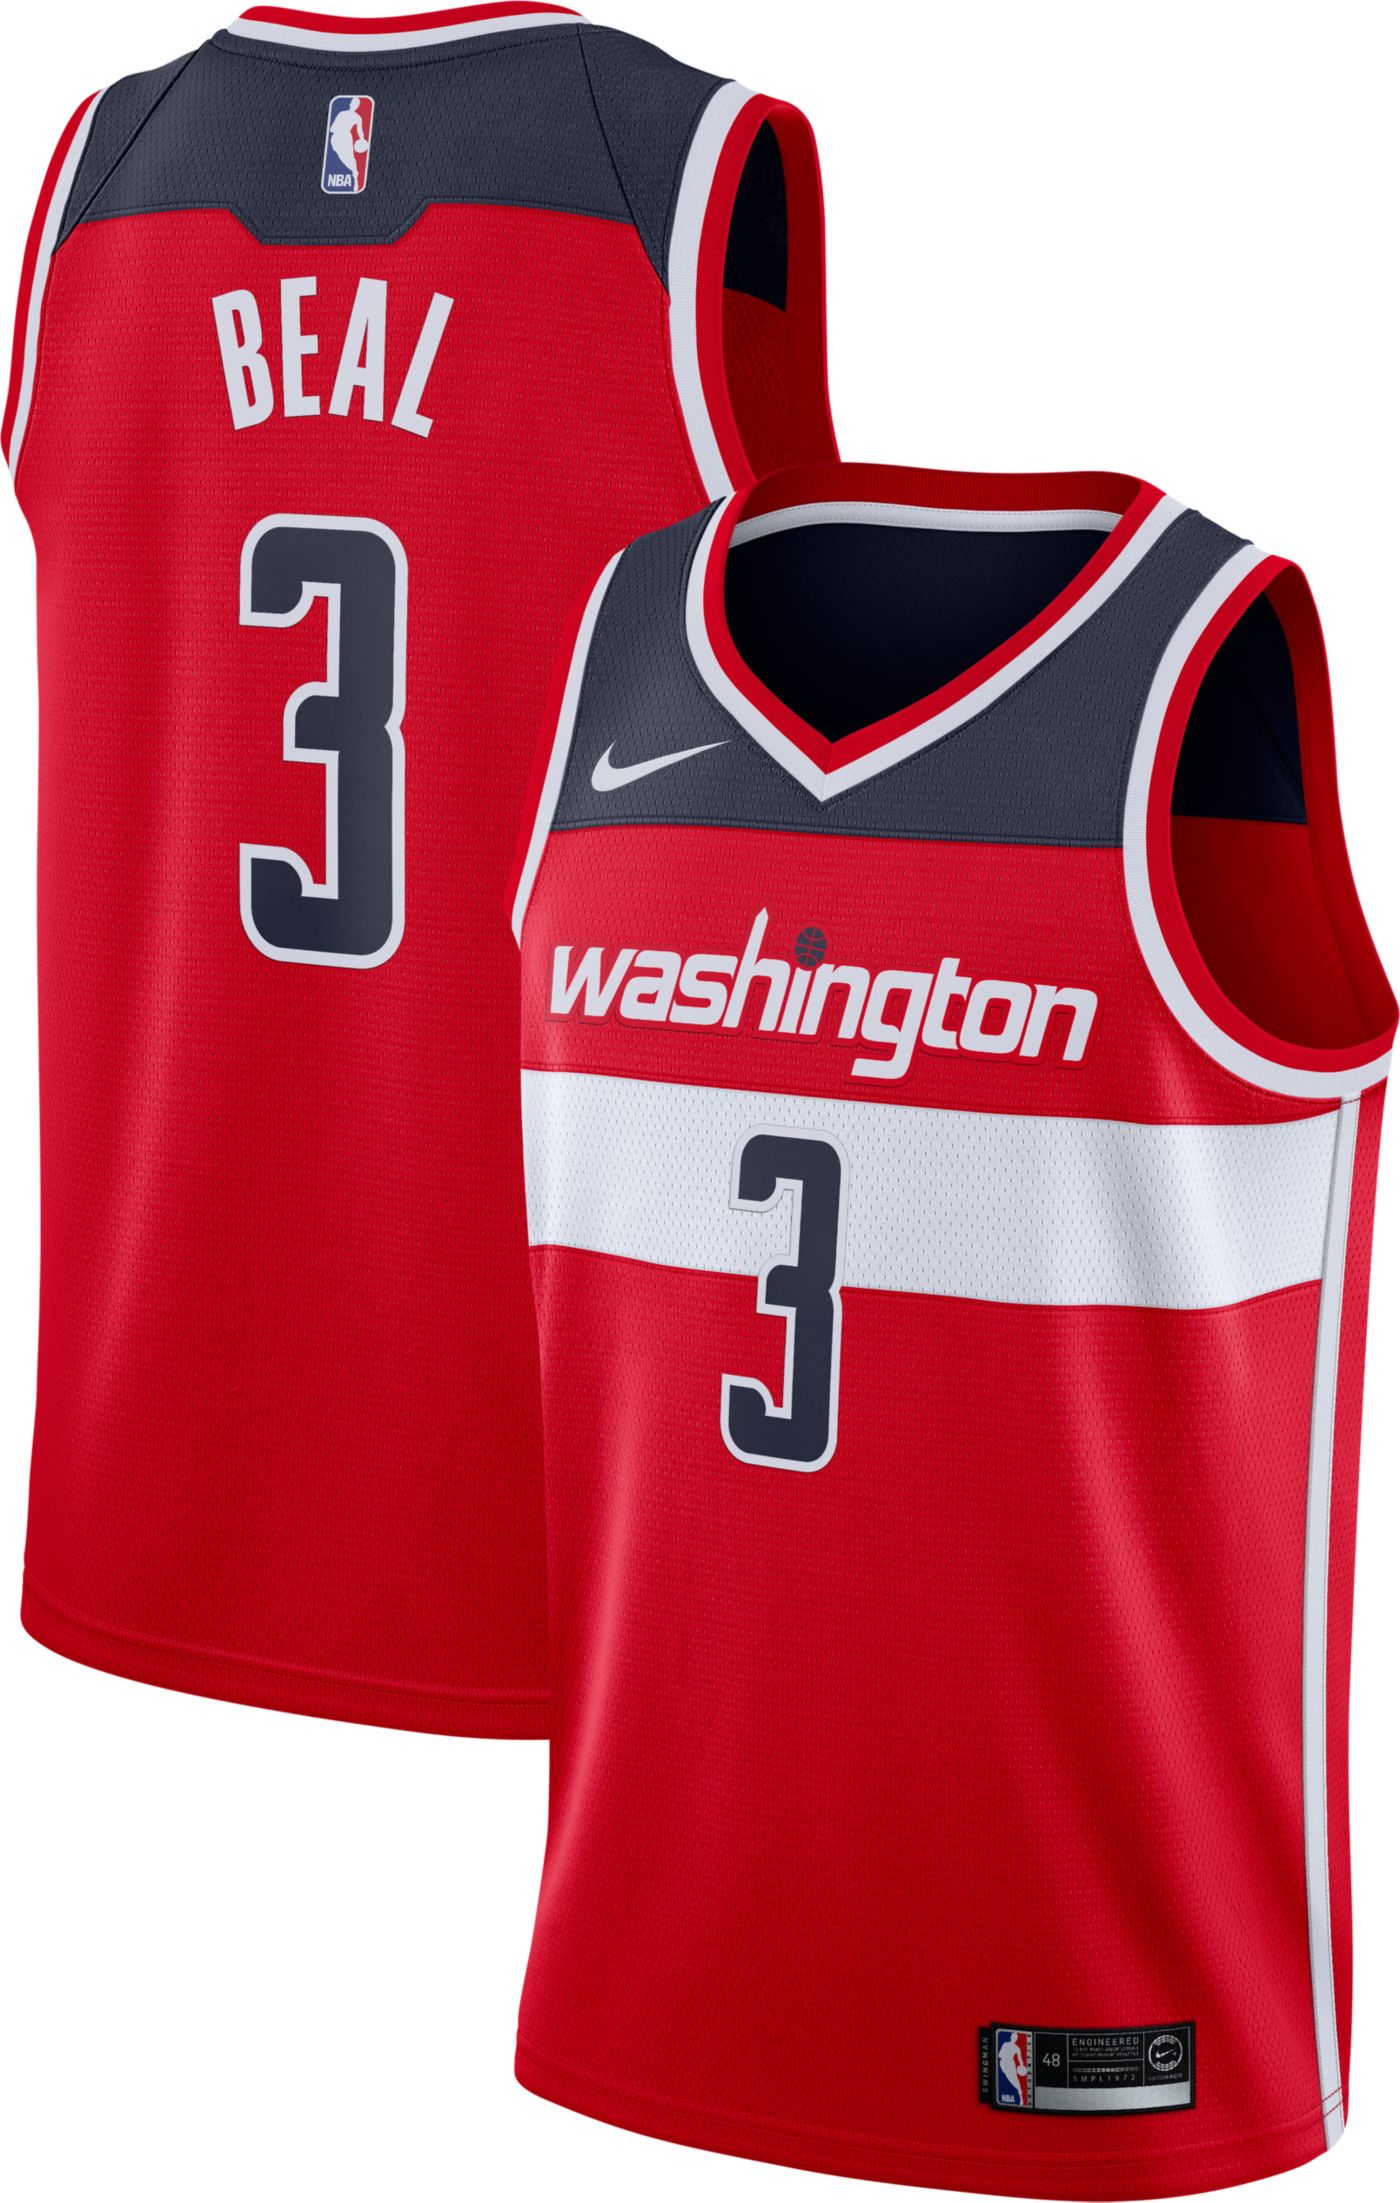 Nike Men's Washington Wizards Bradley Beal #3 Red Dri-FIT Swingman Jersey